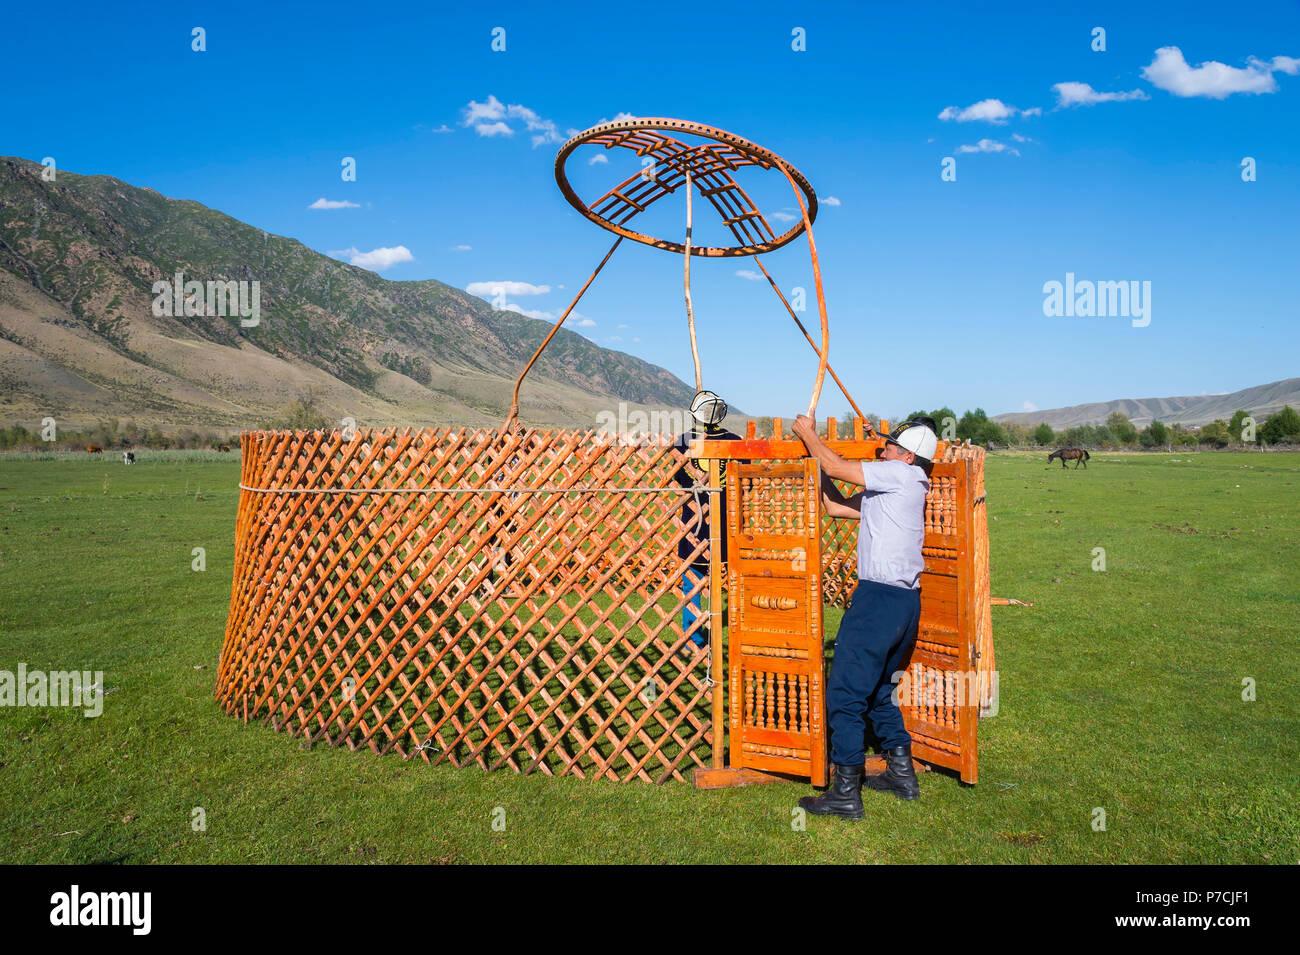 Kazakh men putting up a yurt, For editorial Use only, Sati village, Tien Shan Mountains, Kazakhstan - Stock Image